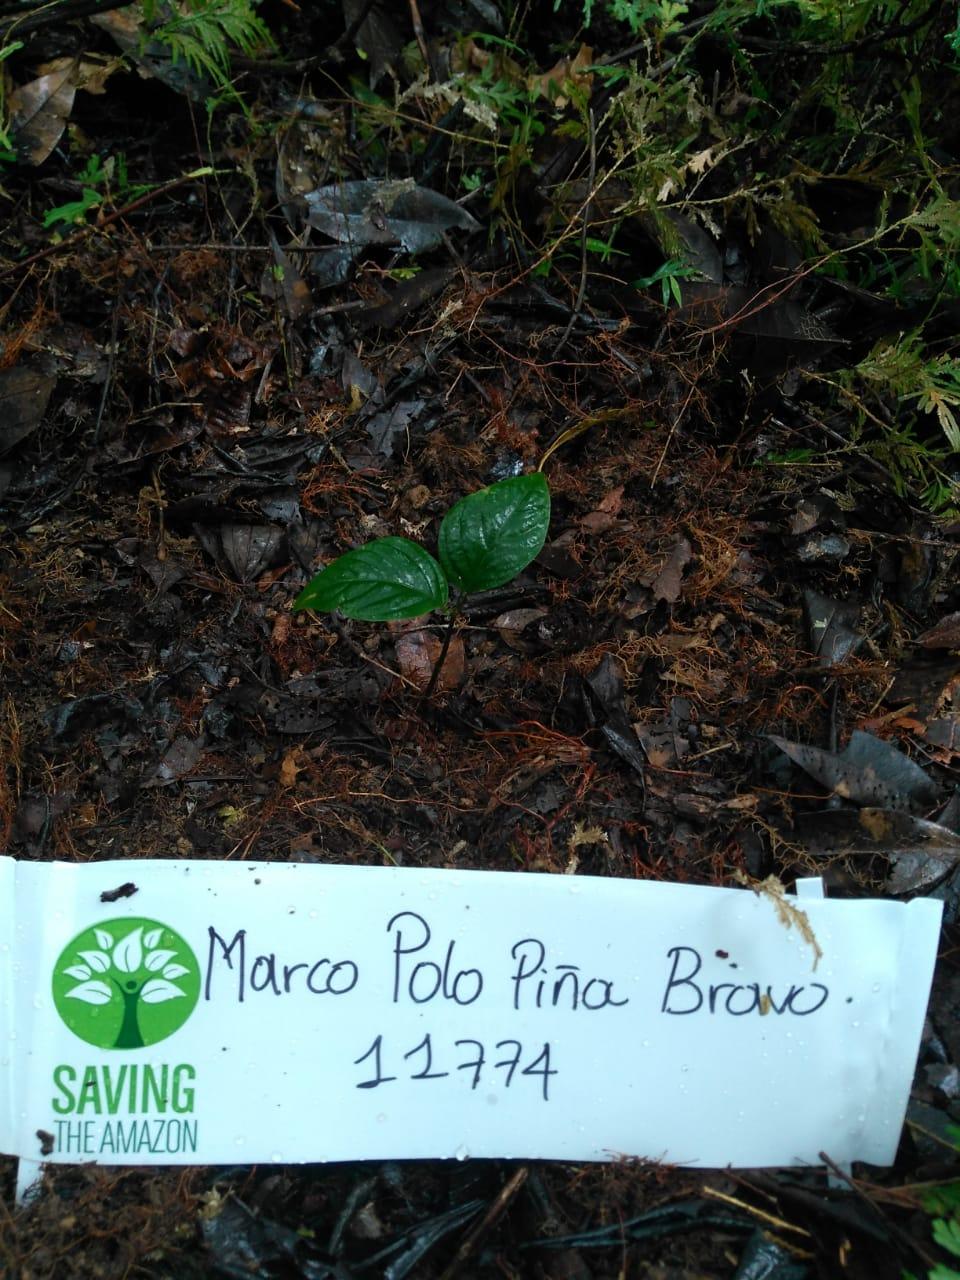 Marco Polo Pineapple Bravo